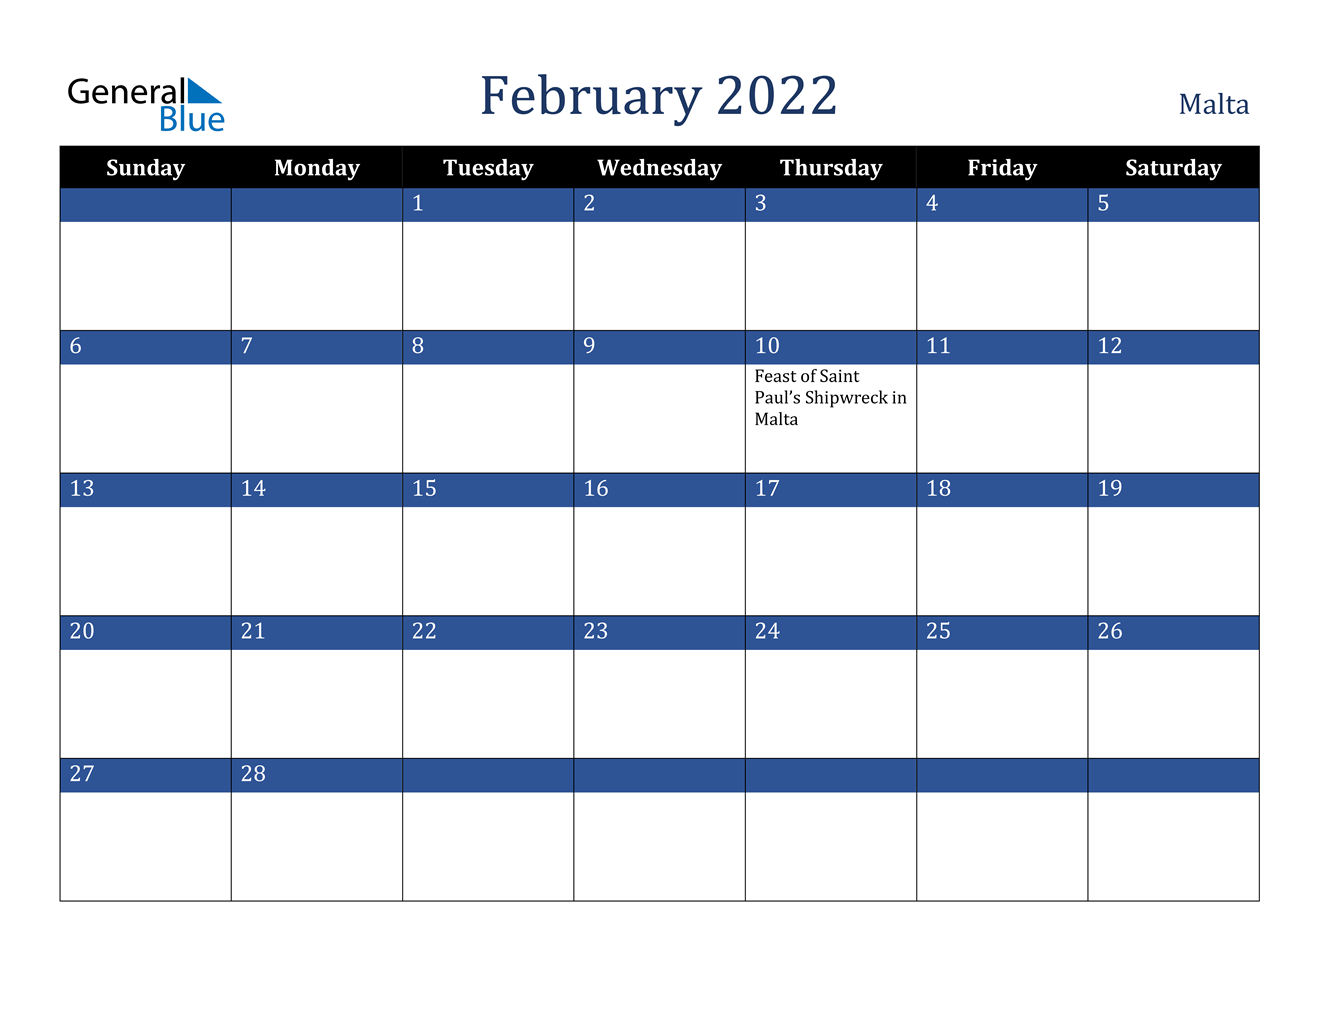 February 2022 Calendar - Malta